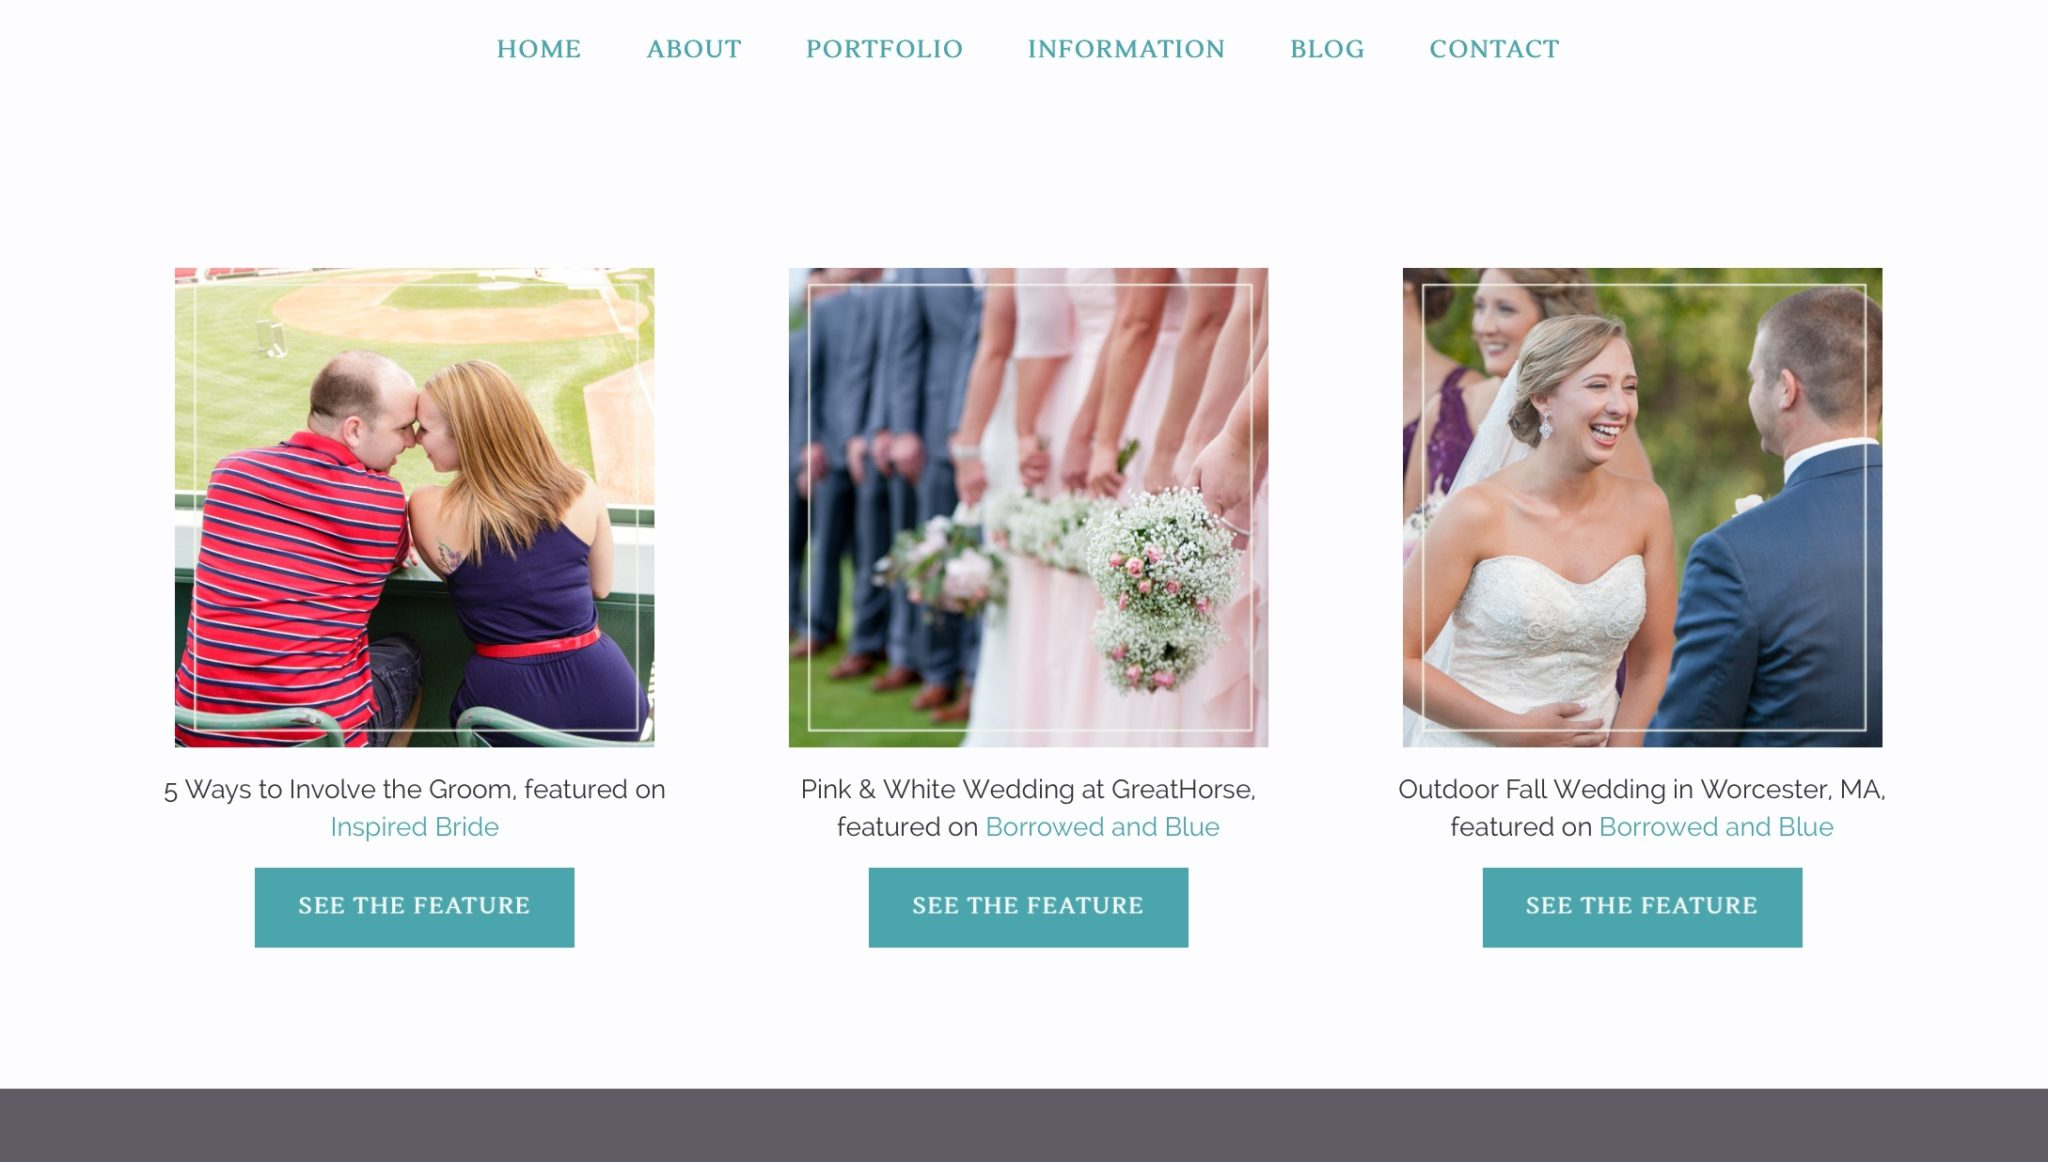 custom design for wedding photographers